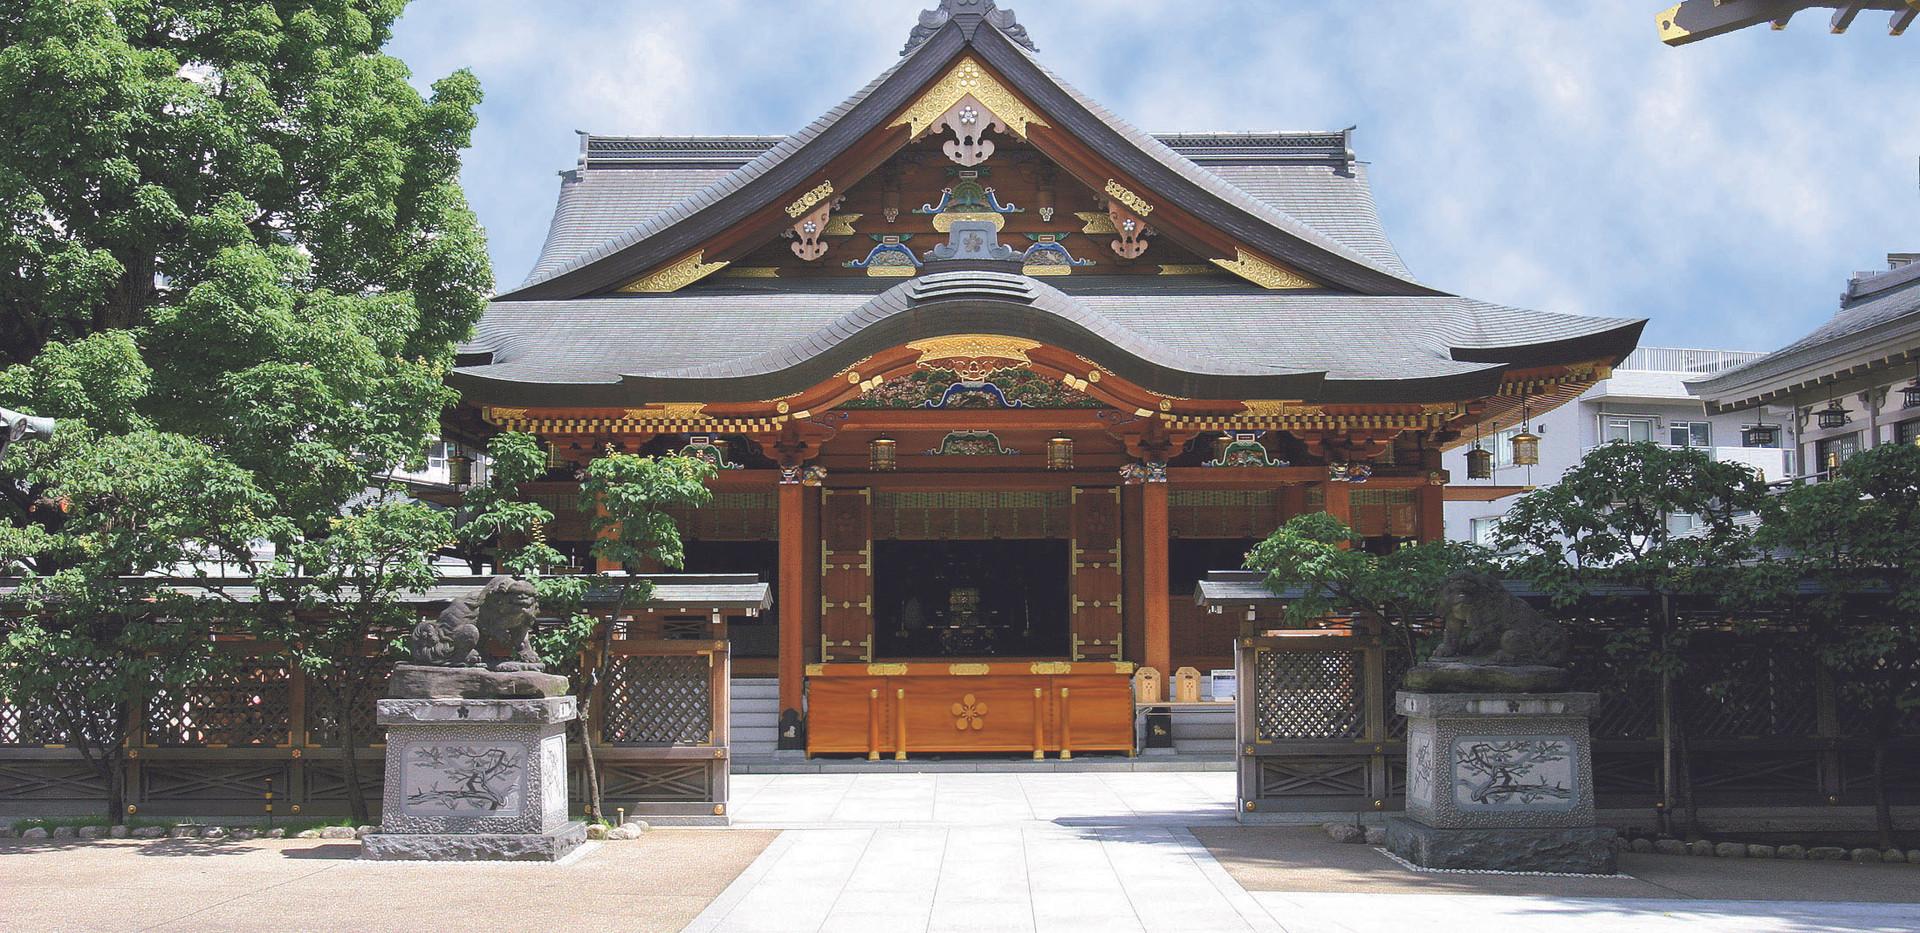 GB湯島天神社殿正面4.jpg